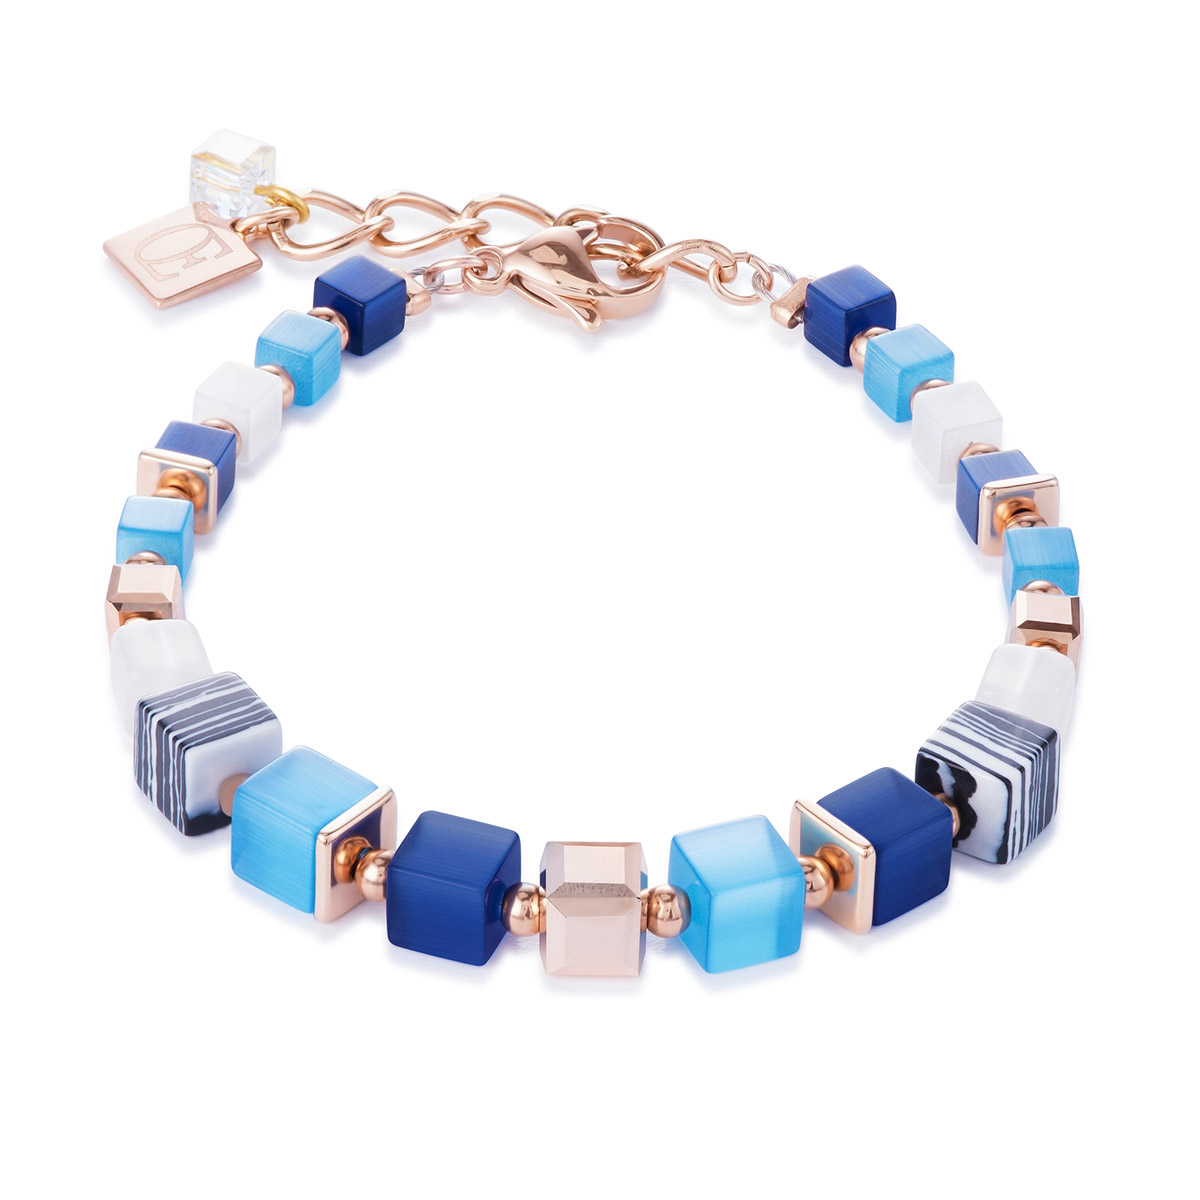 bei Uhrcenter: Coeur de Lion 4963/30-0706 Damen-Armband Blau/Türkis - Schmuck